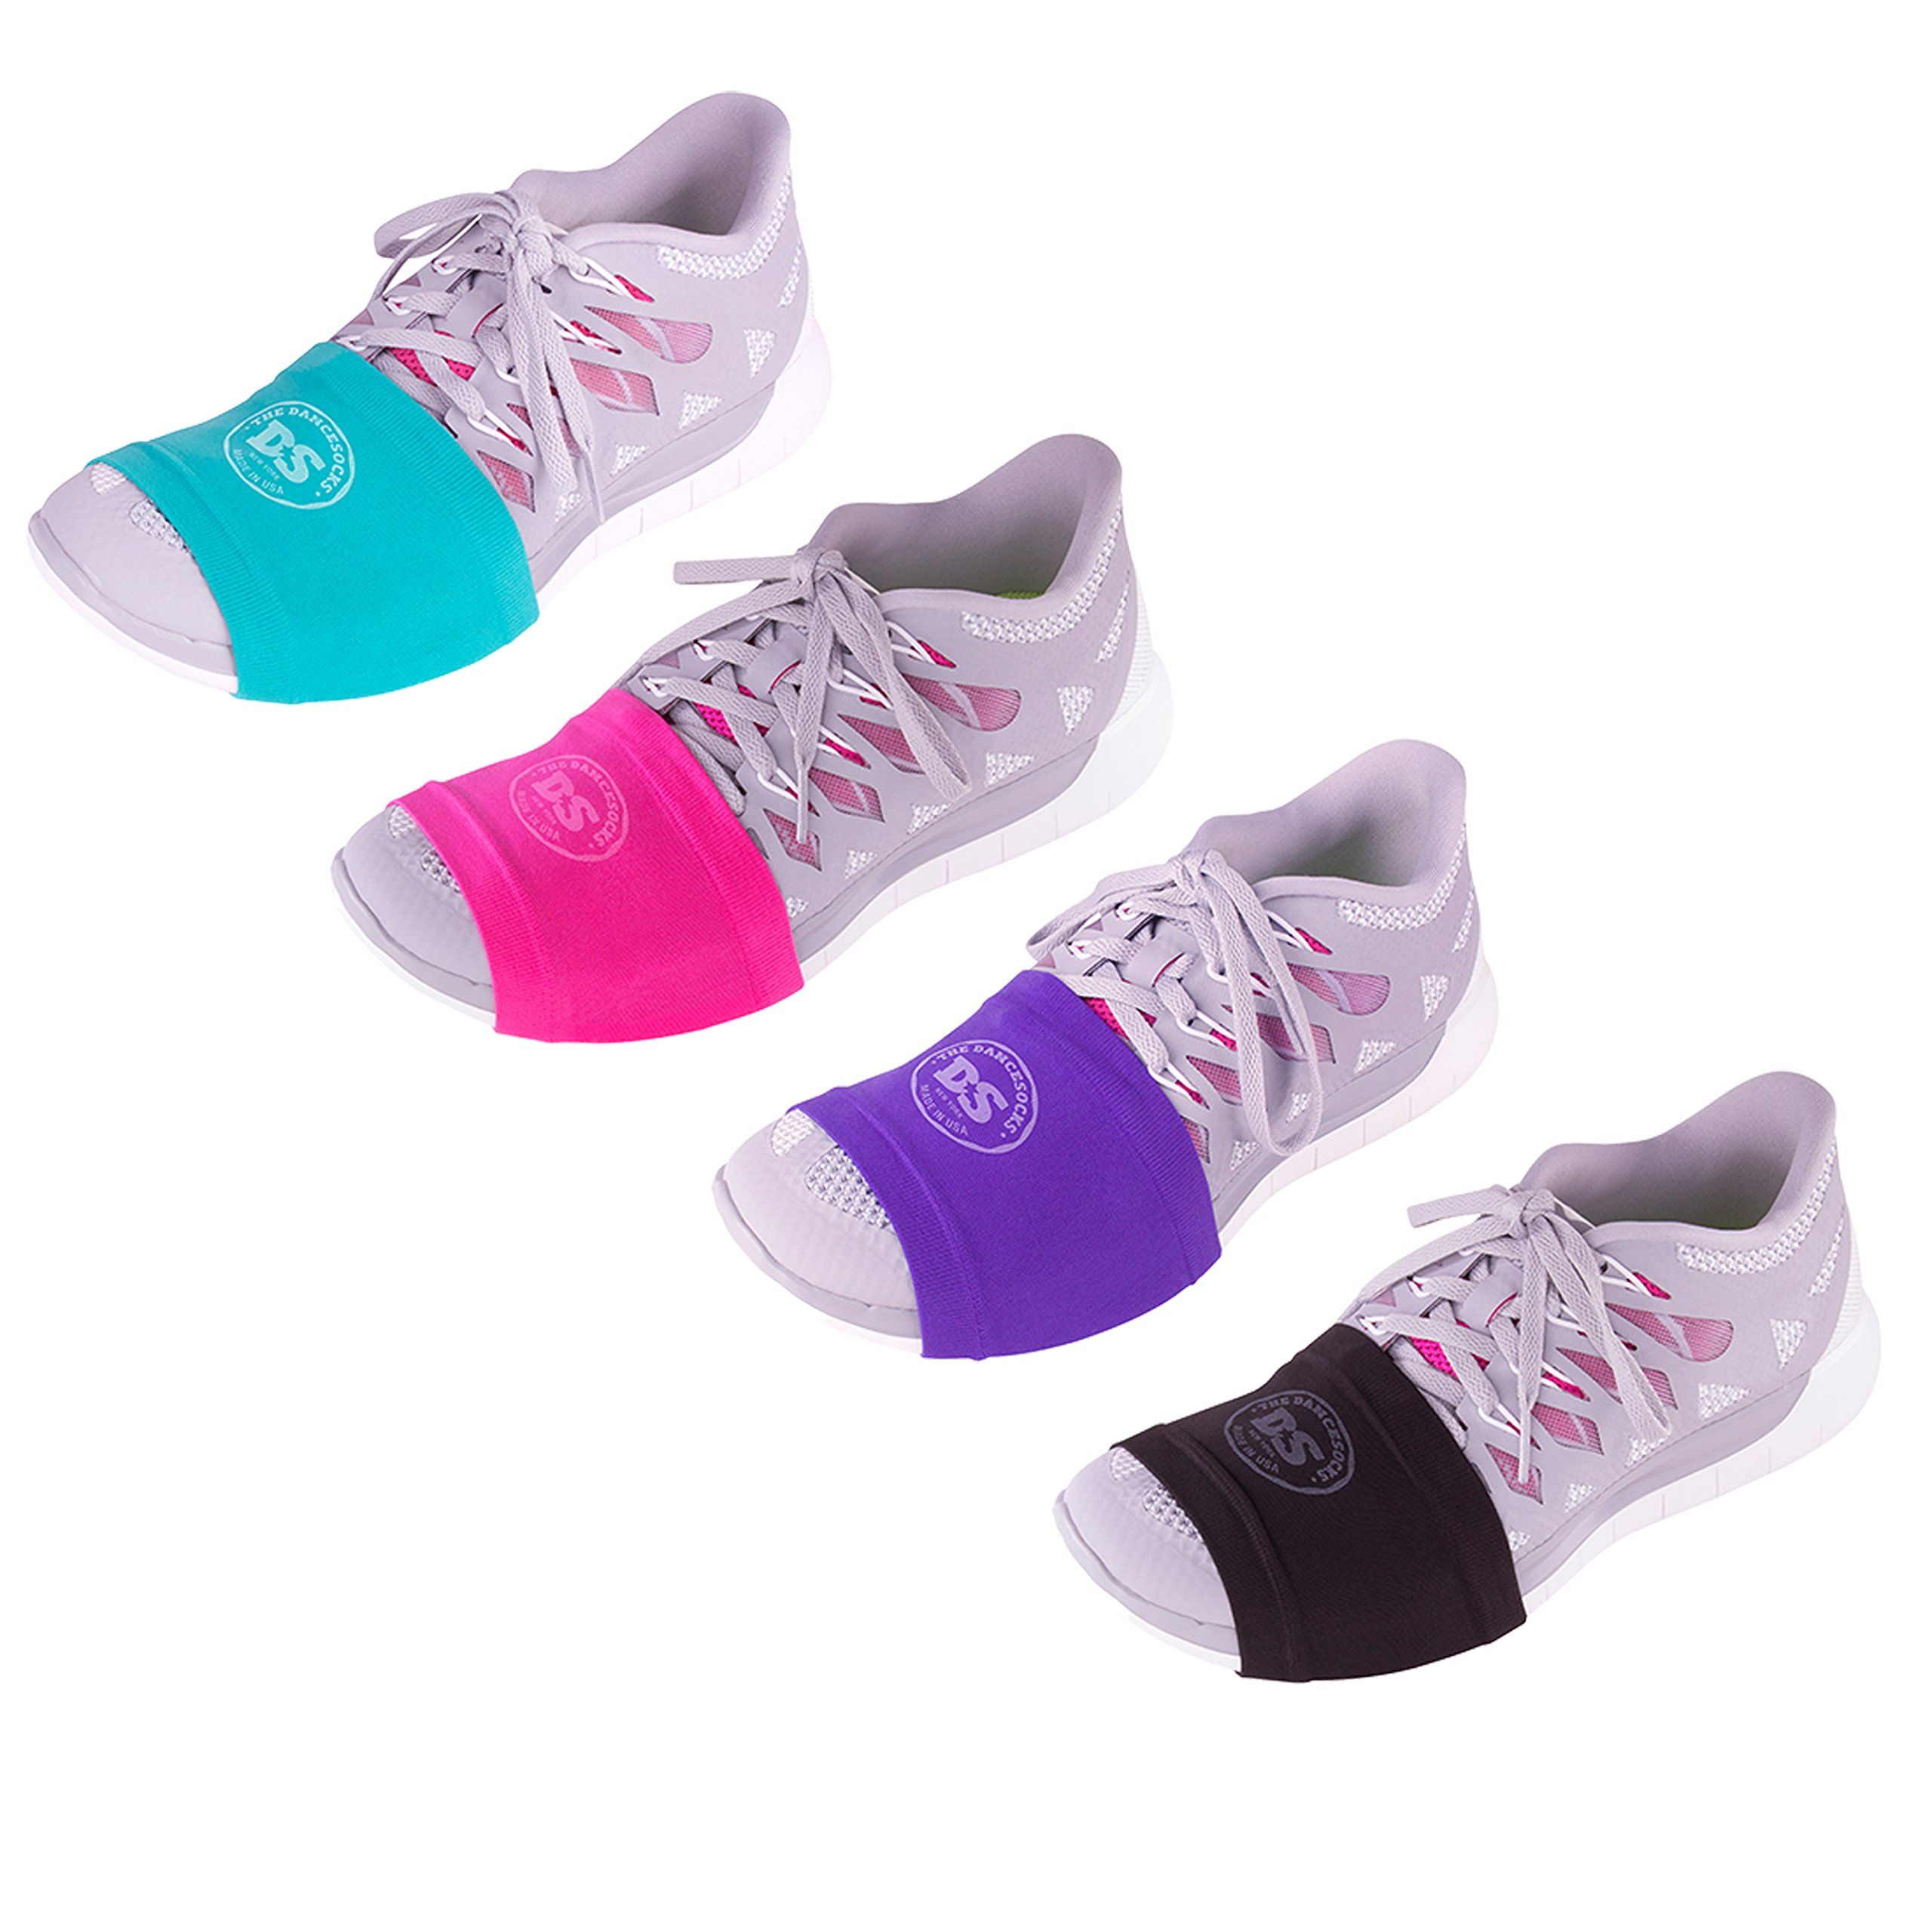 Zumba shoes, Dance socks